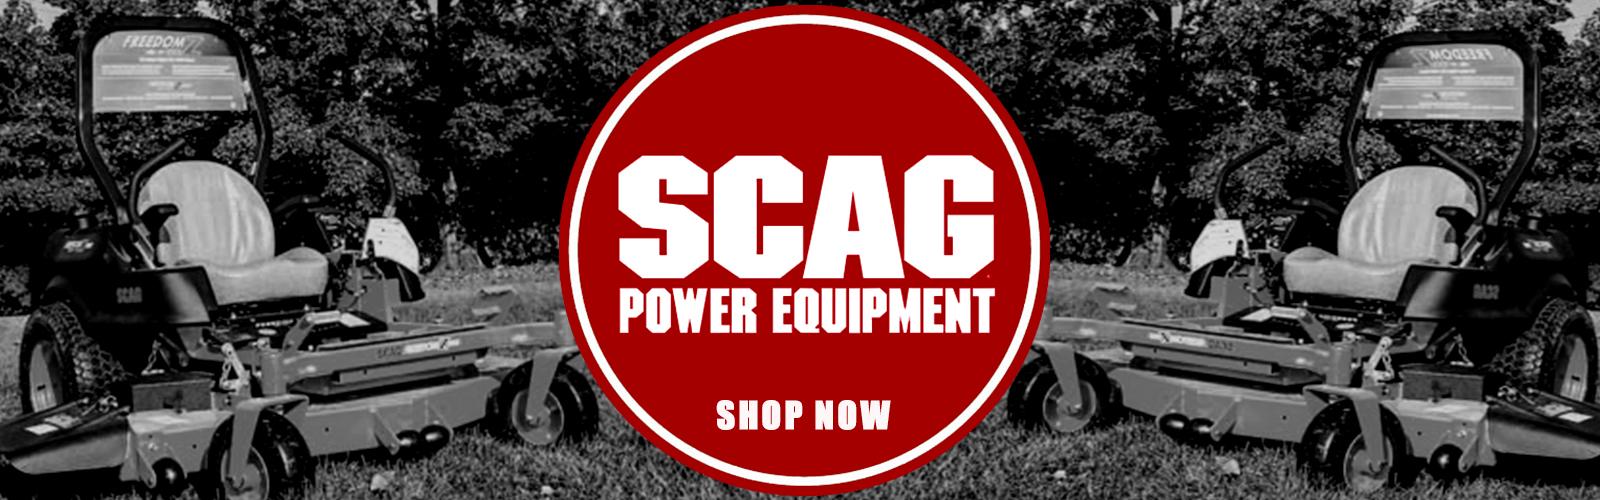 SCAG header.jpg